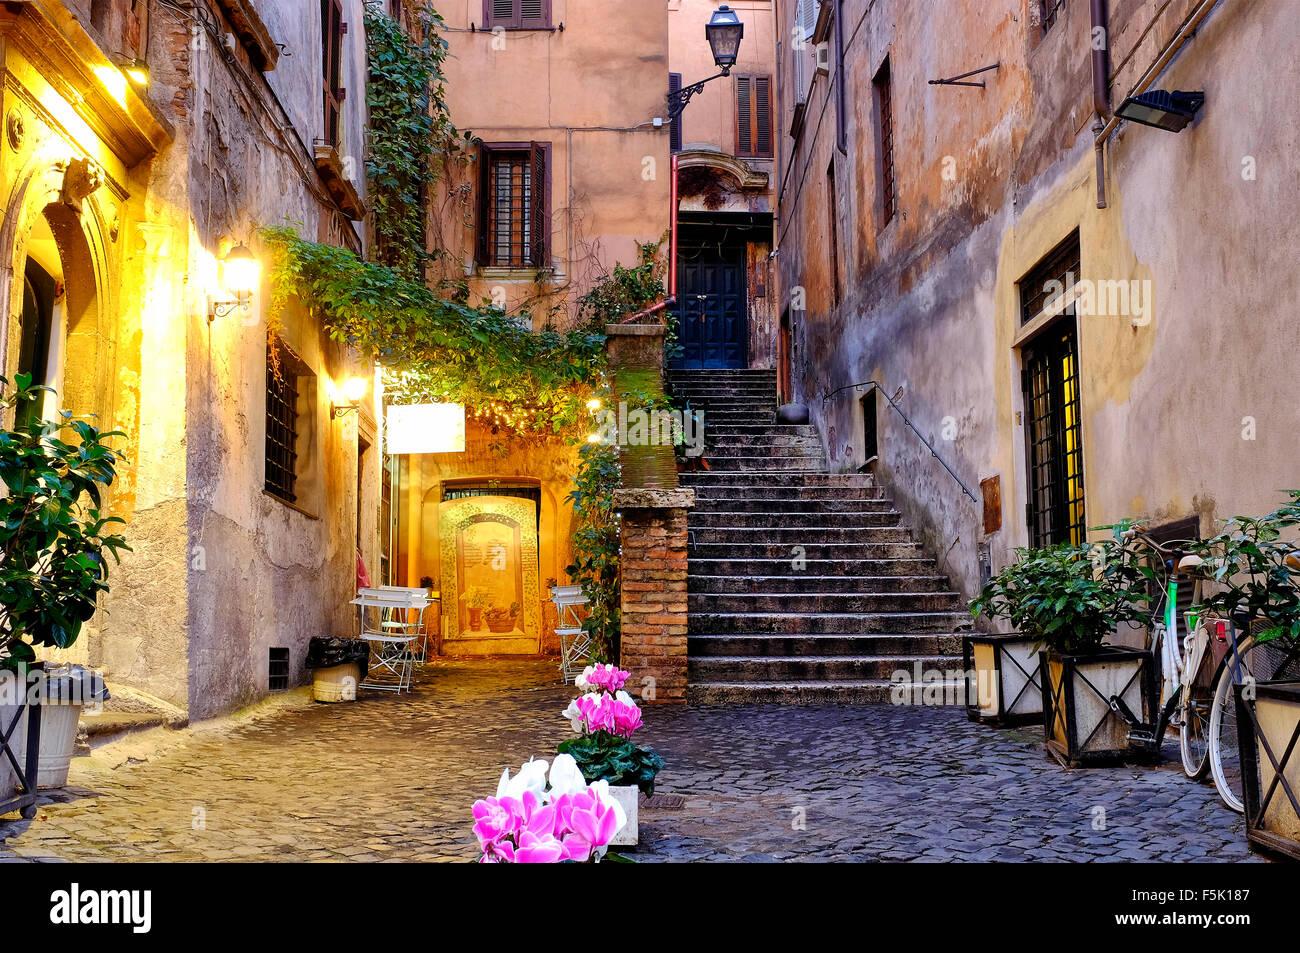 Via di San Simone, Rome Italy - Stock Image